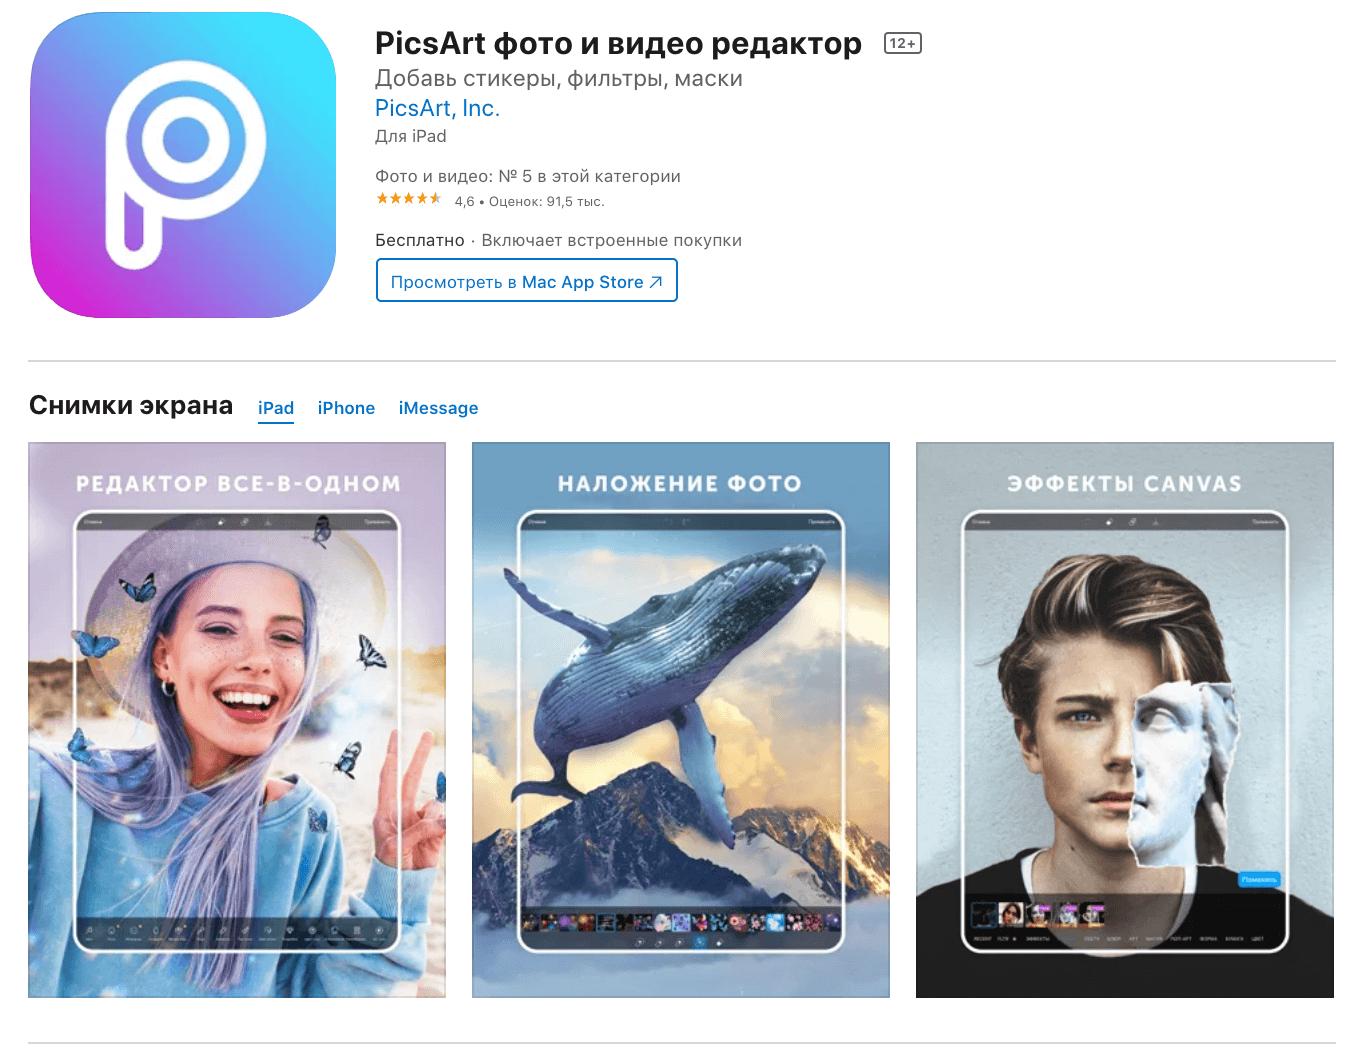 PicsArt-mobile app